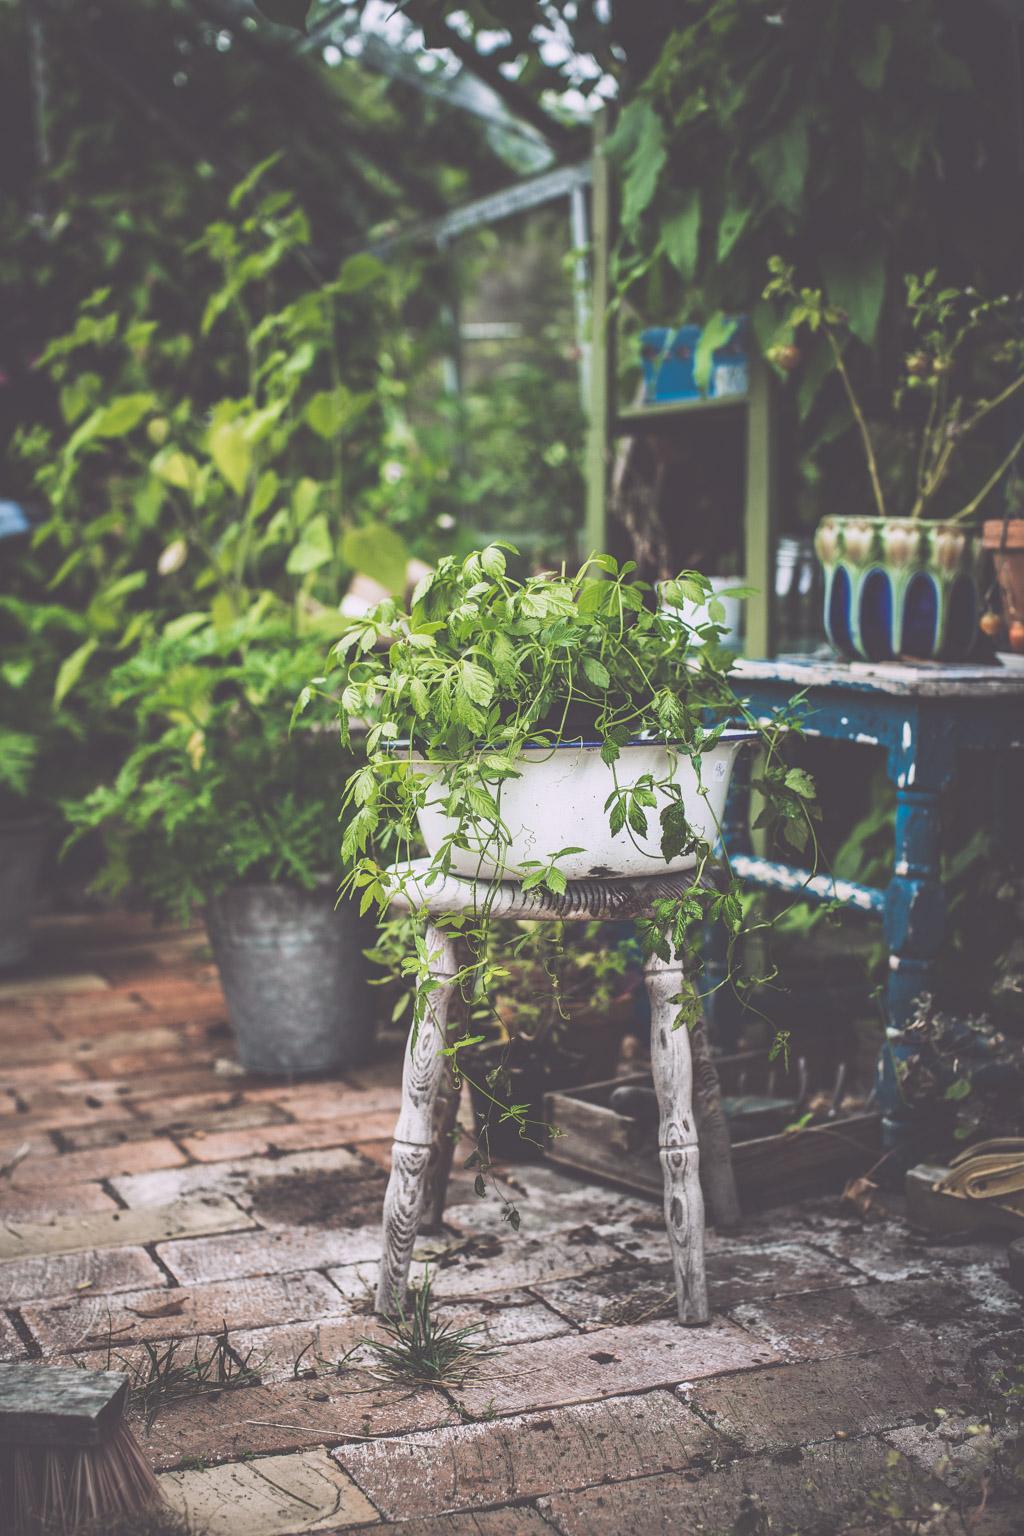 gardenhouse_kristin lagerqvist-0260